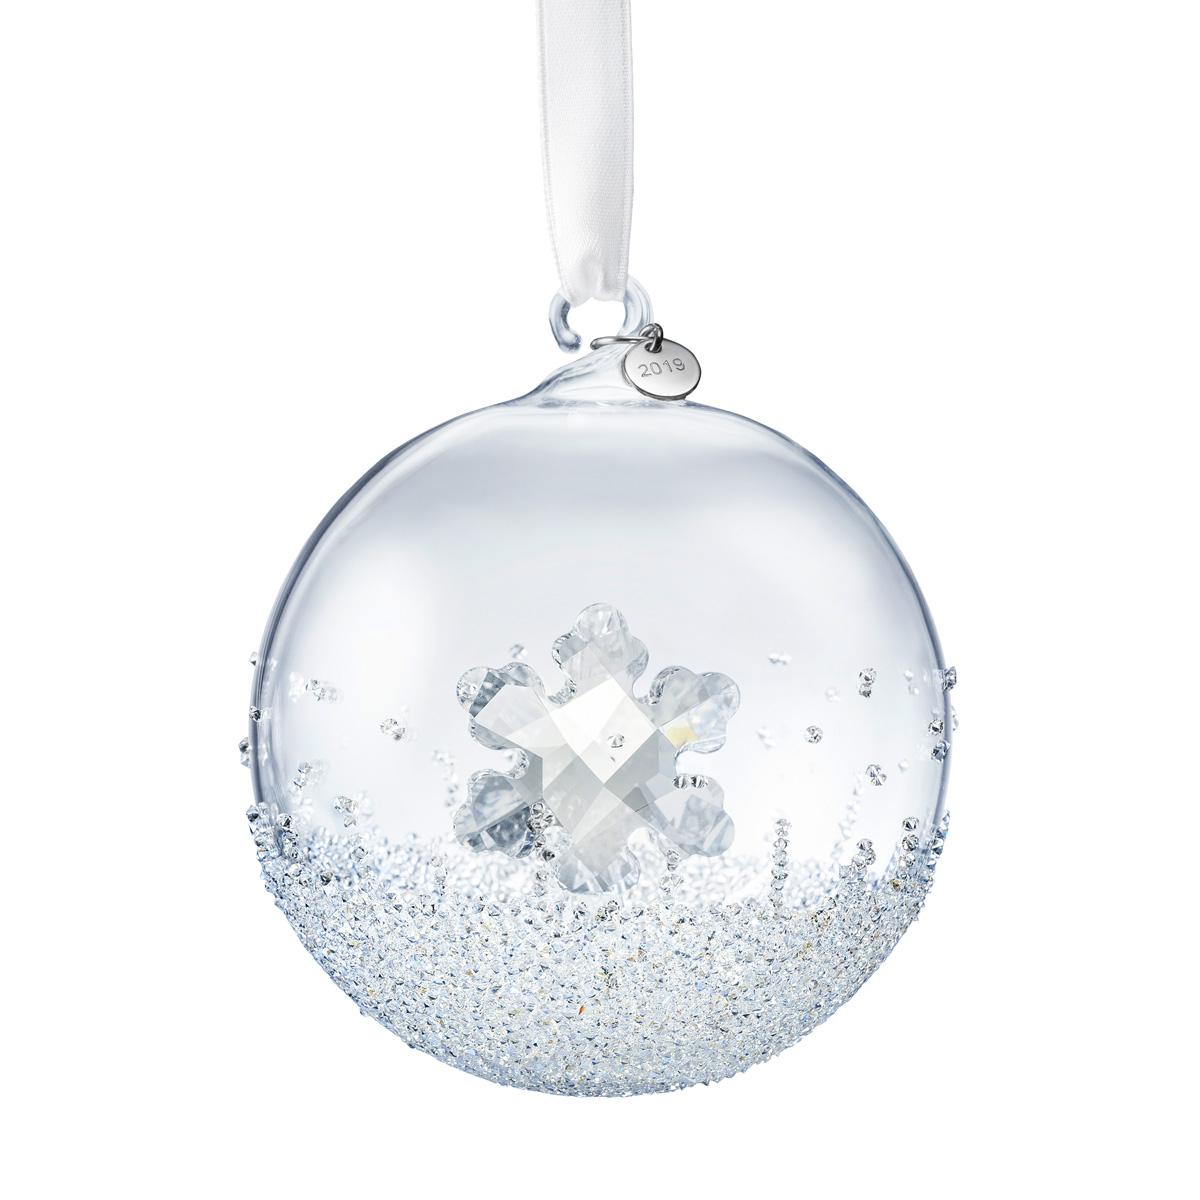 Swarovski Christmas Ball Ornament, Annual Edition 2019